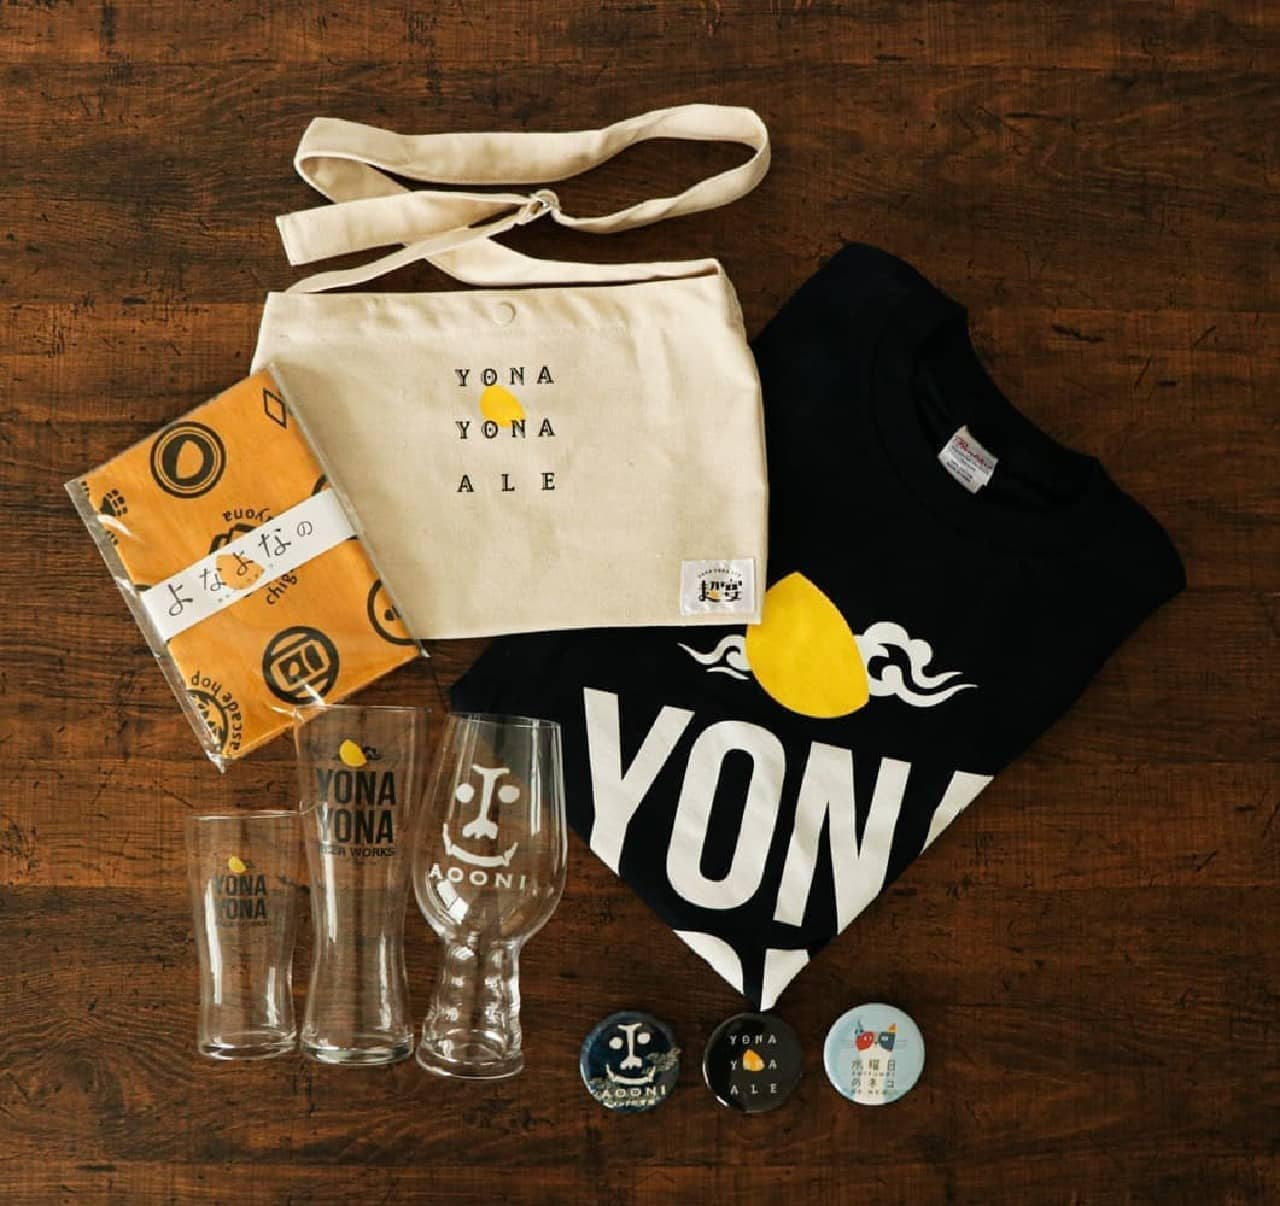 「YONA YONA BEER WORKS」オフィシャルグッズ福袋